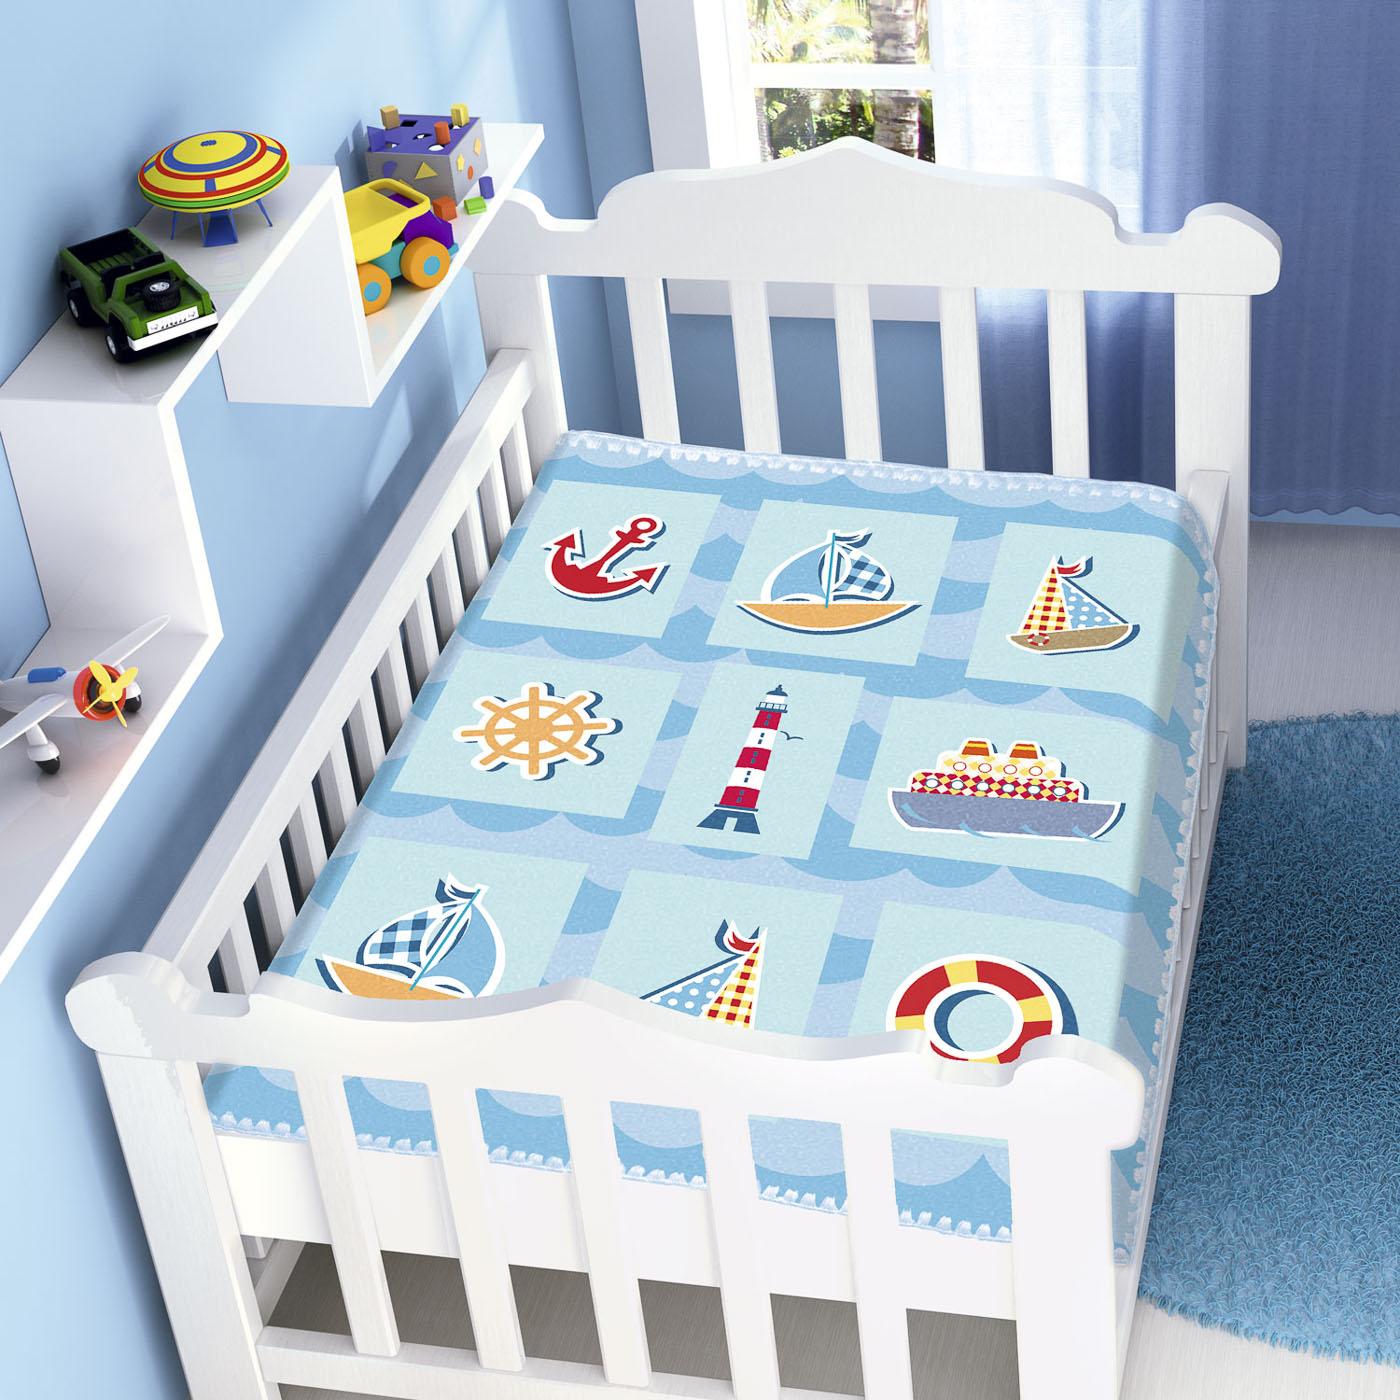 Cobertor Para Bebê Infantil Jolitex Raschel Barquinhos Azul